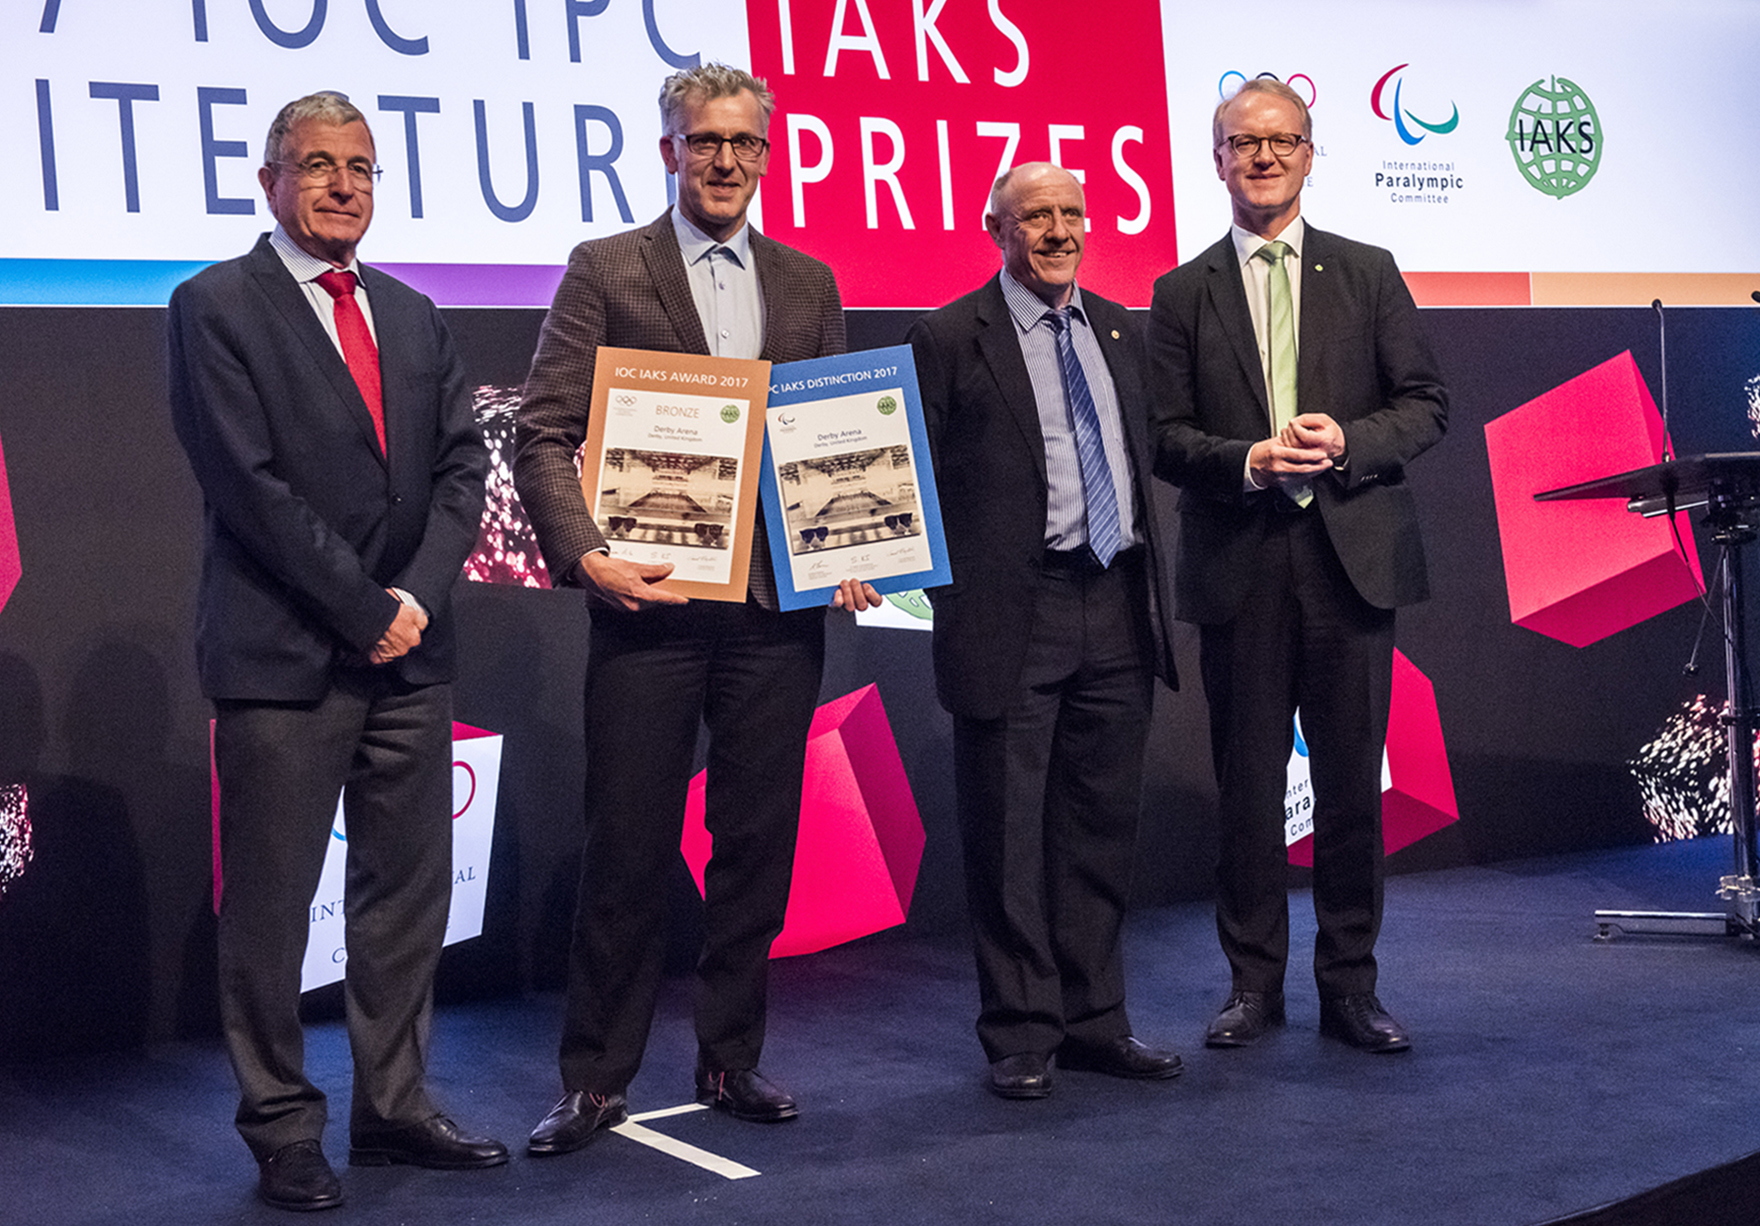 Iaks Awards International Sports Architecture Awards Derby Arena Presentation Lh